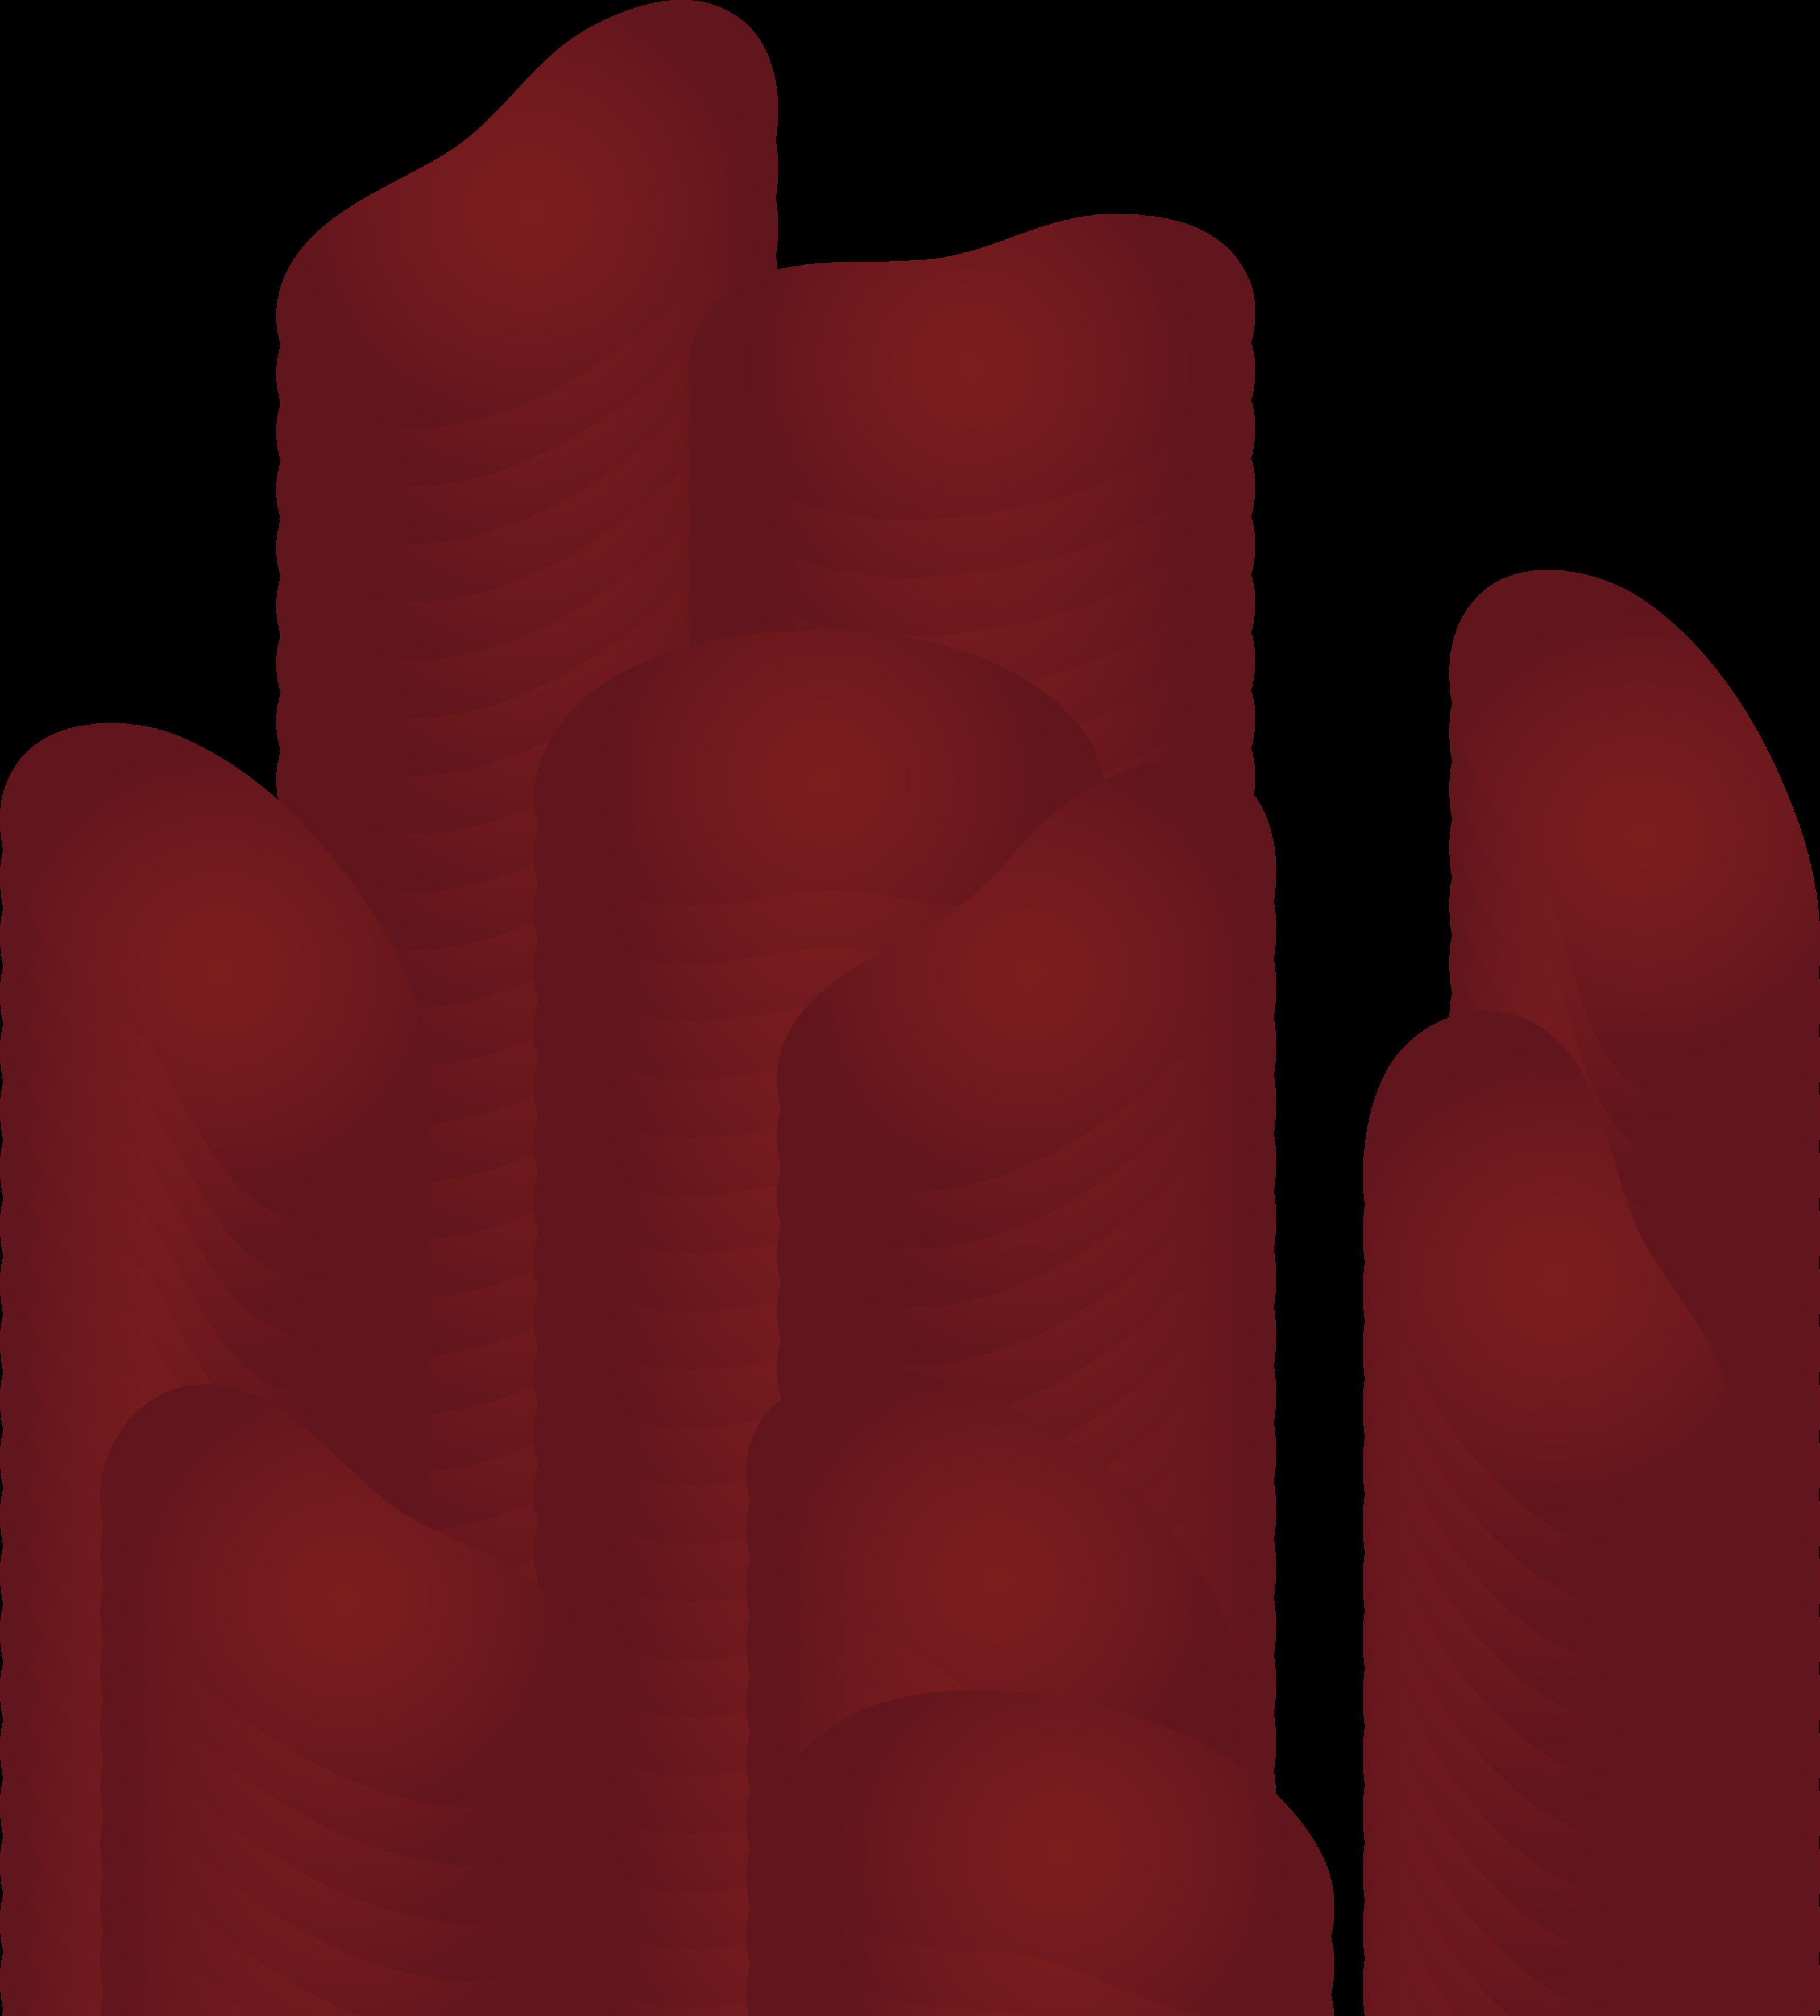 Beans Clipart